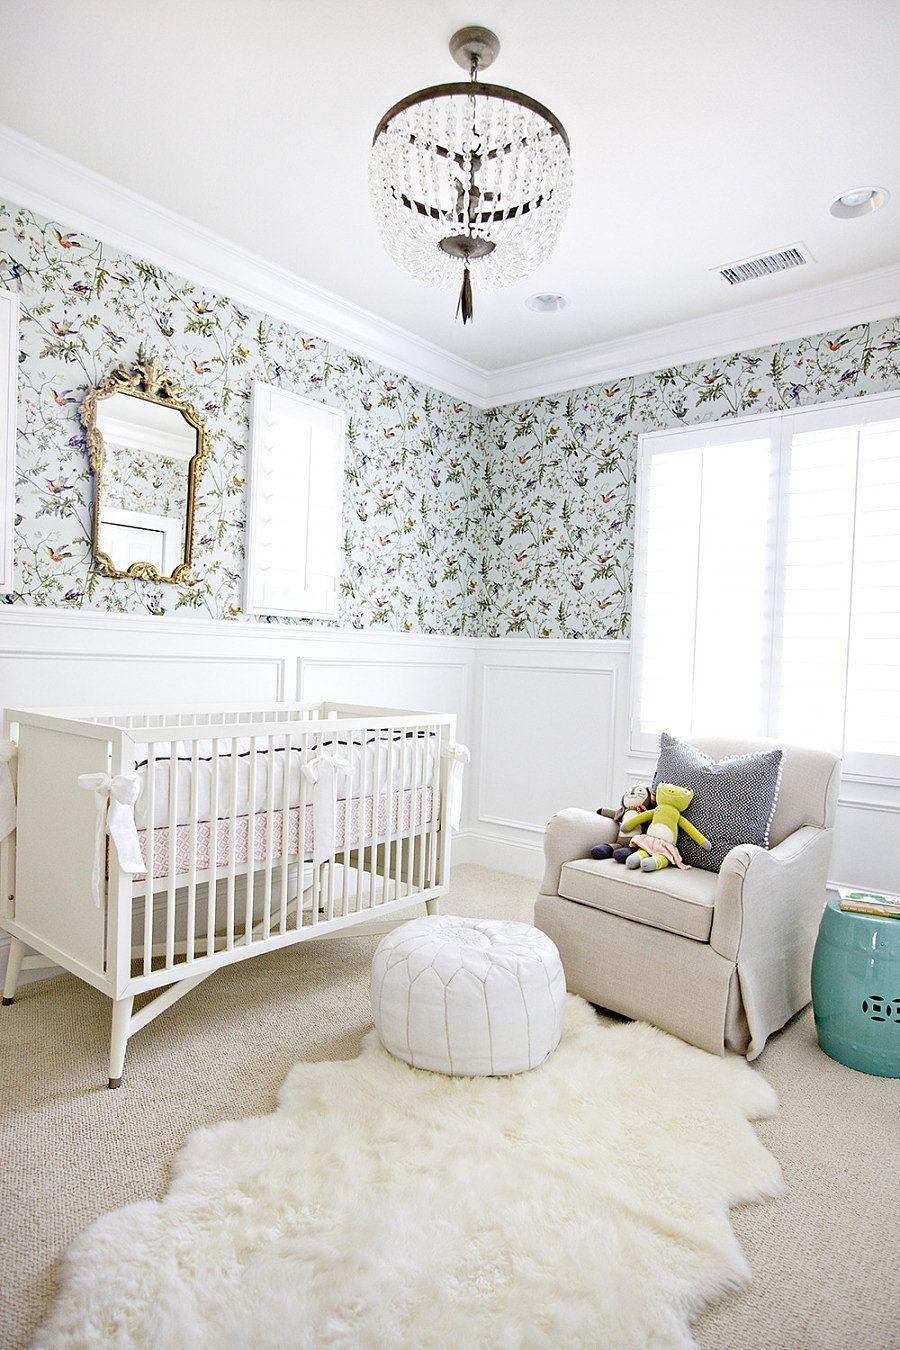 Layered Rugs Carpet Nursery Room Design Pretty Nurseries Baby Girls Nursery